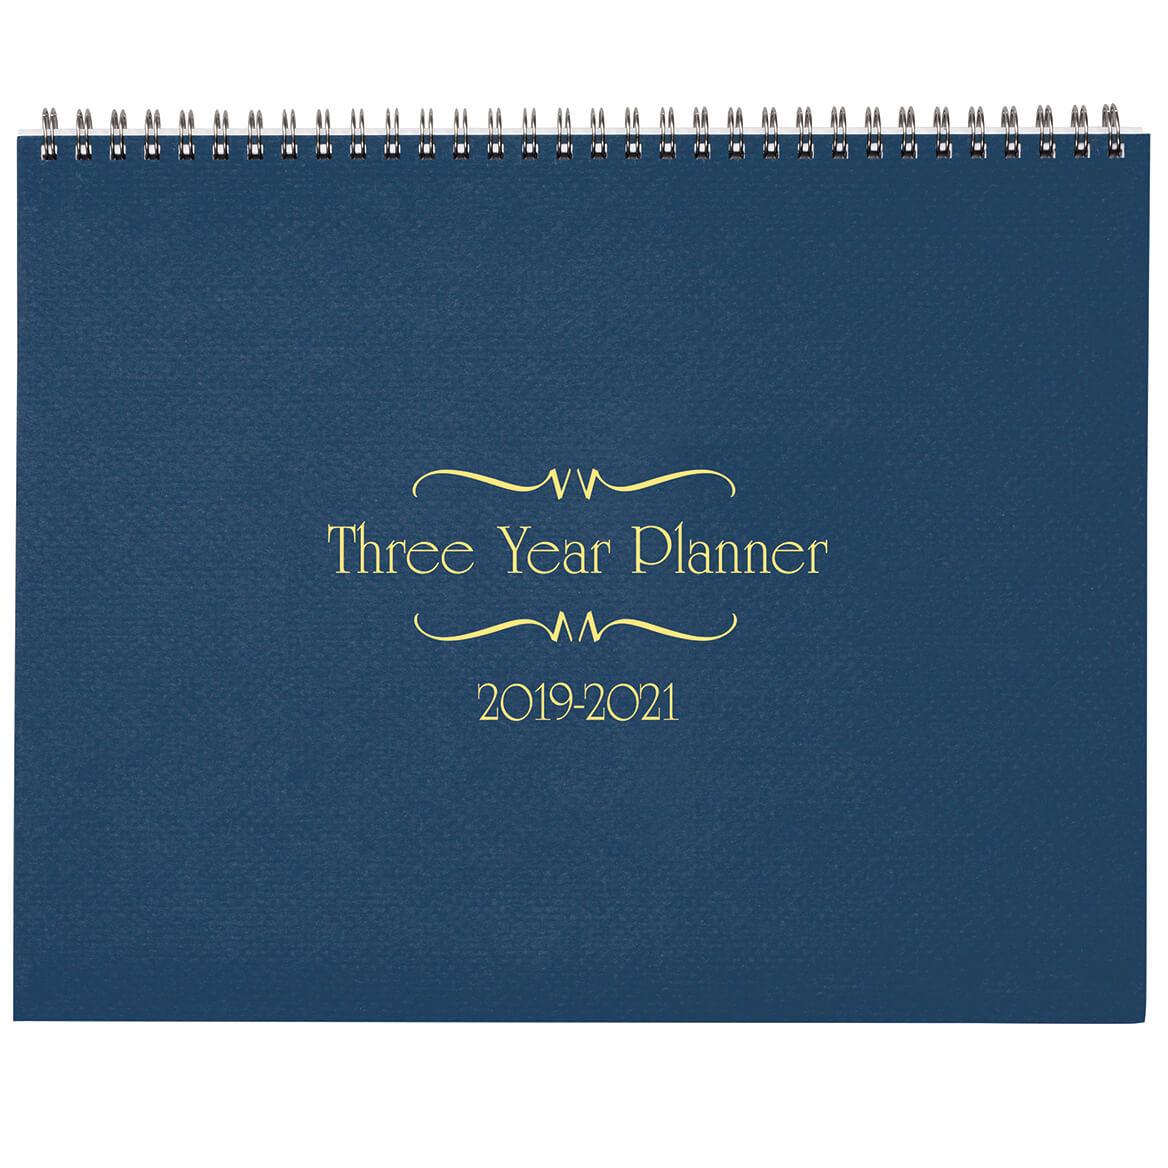 3 year calendar 2019 2021